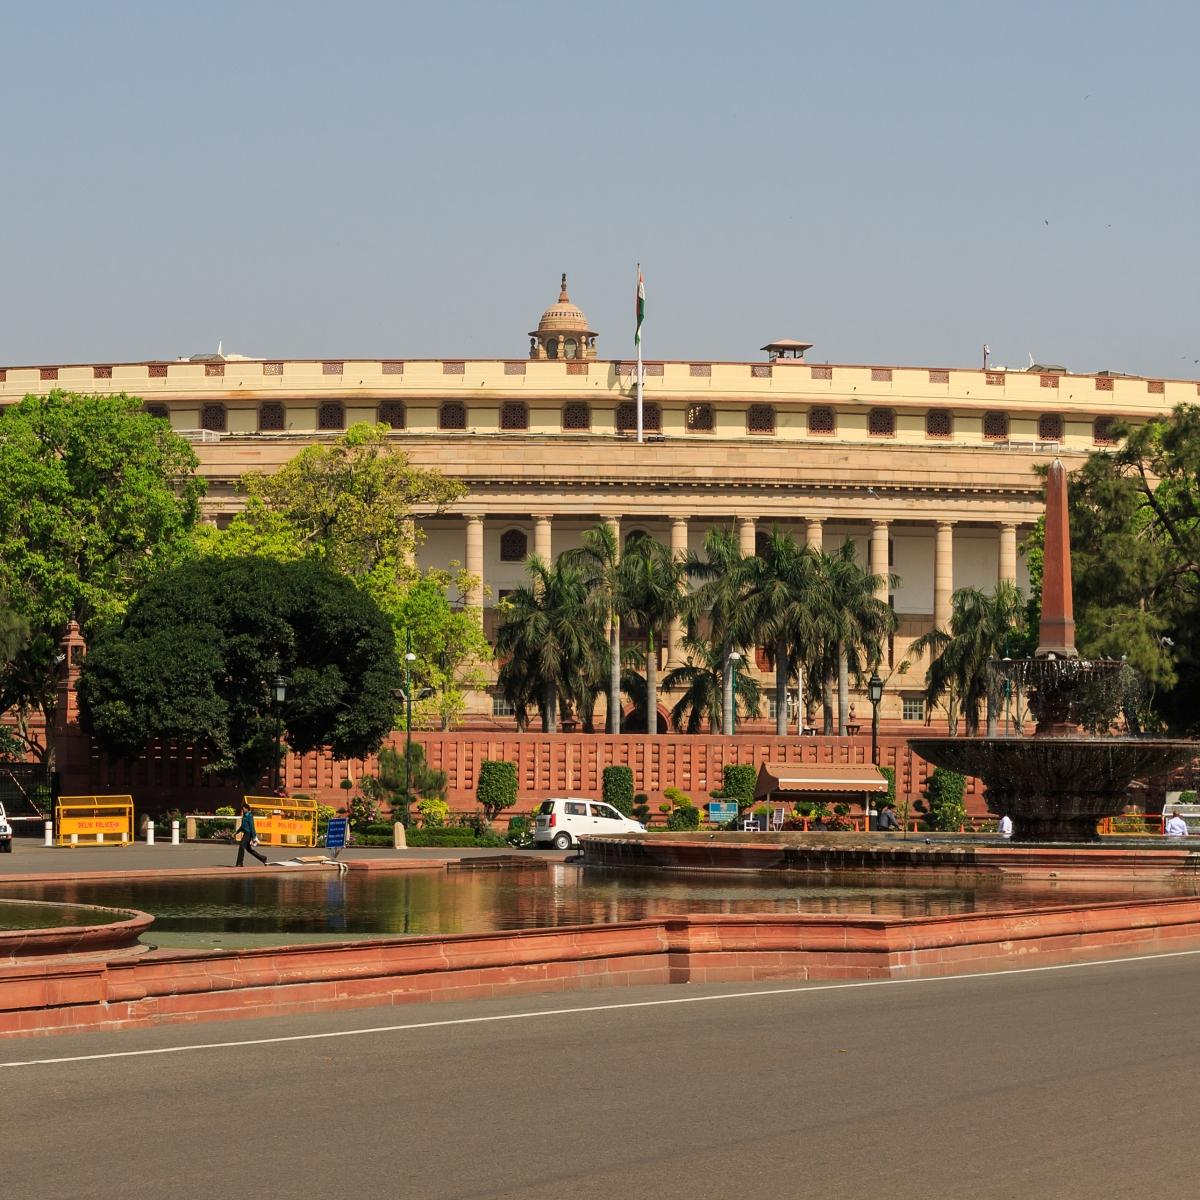 Parliament monsoon session highlights: Rajya Sabha adjourned till 9:00 am tomorrow